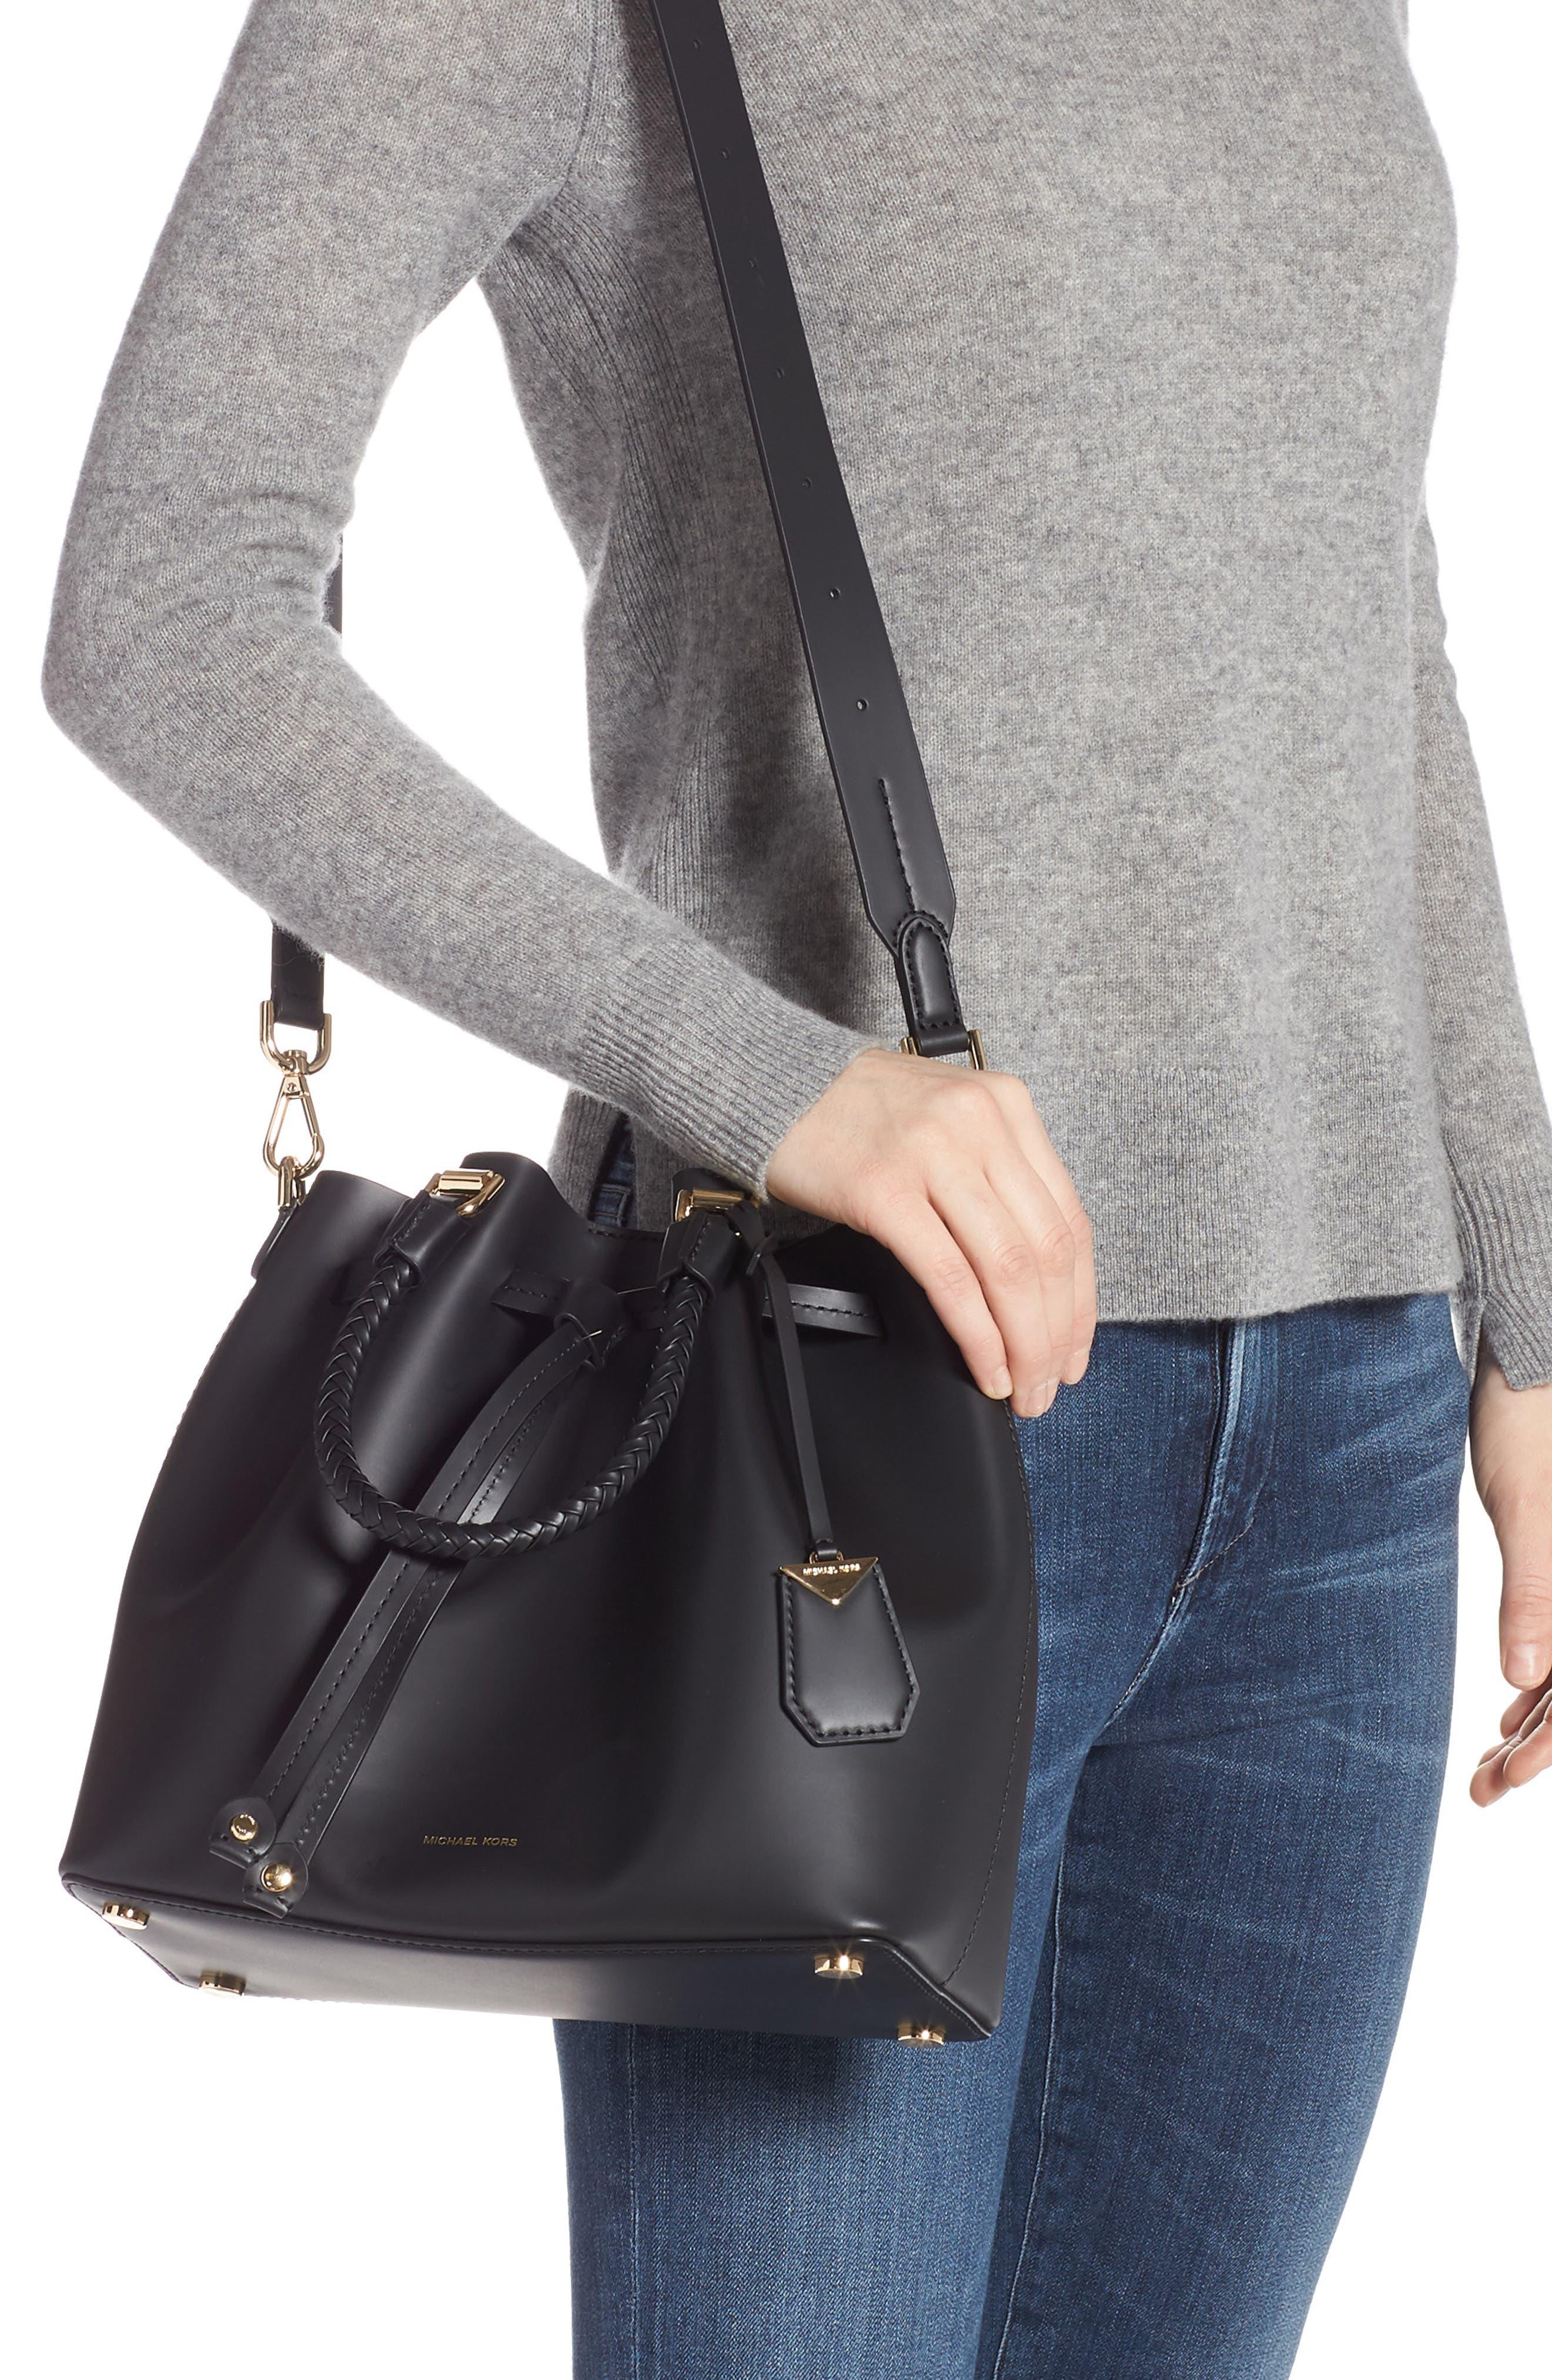 Blakely Leather Bucket Bag,                             Alternate thumbnail 2, color,                             BLACK